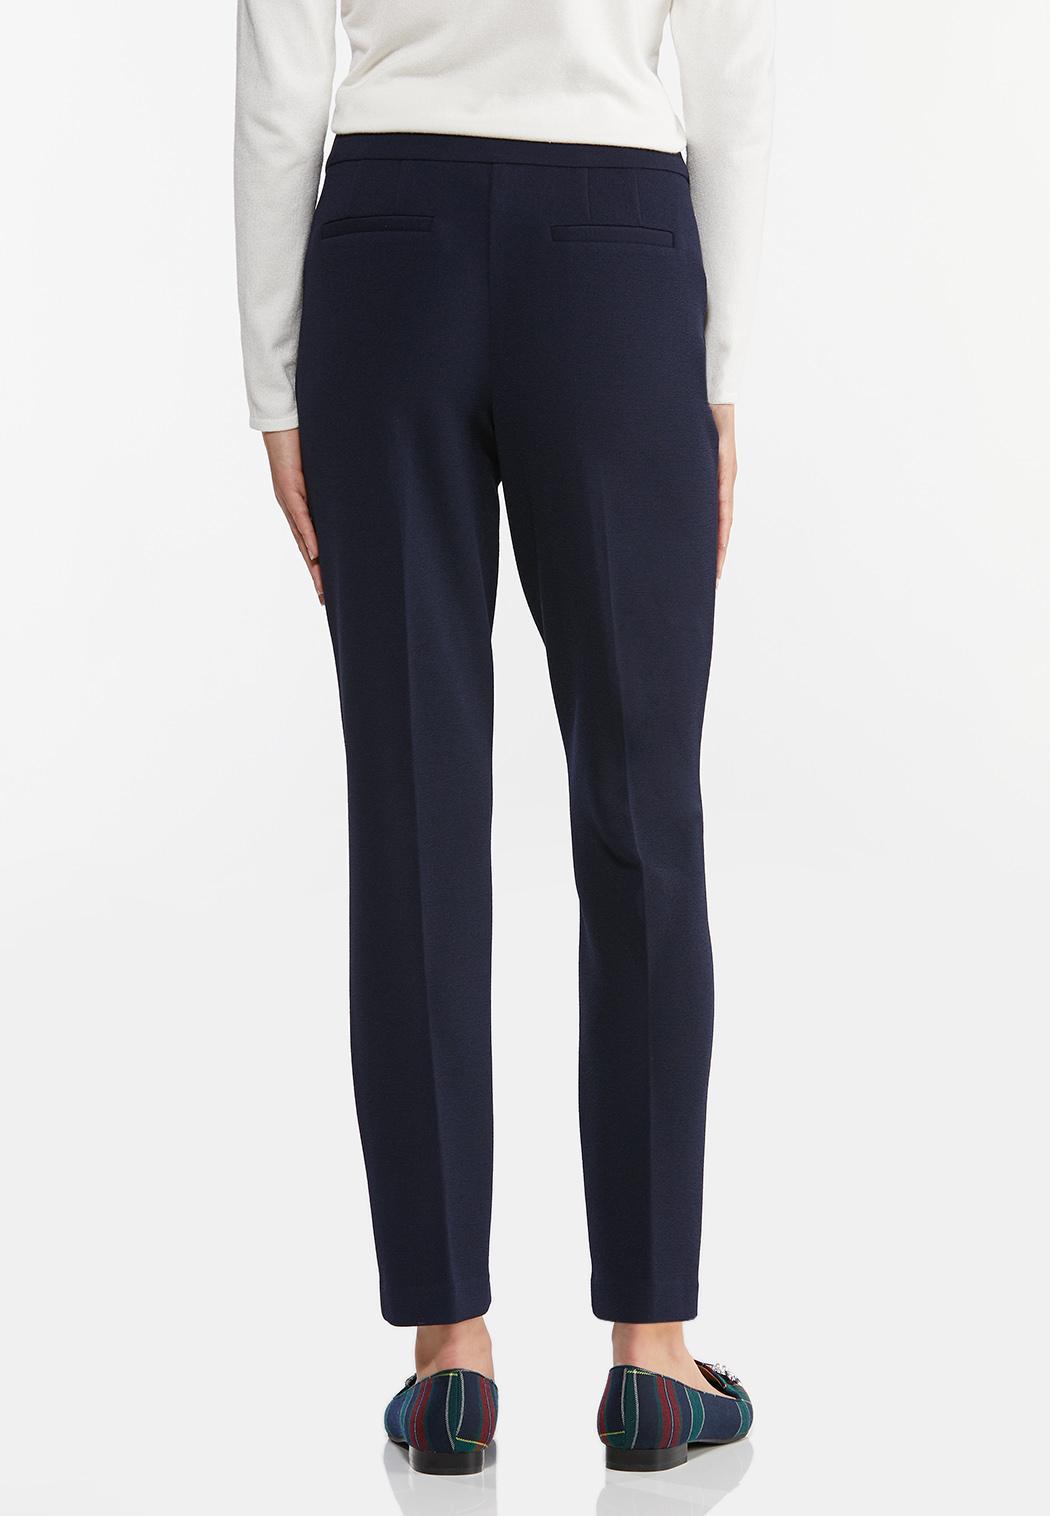 Petite Textured Slim Pants (Item #44461708)